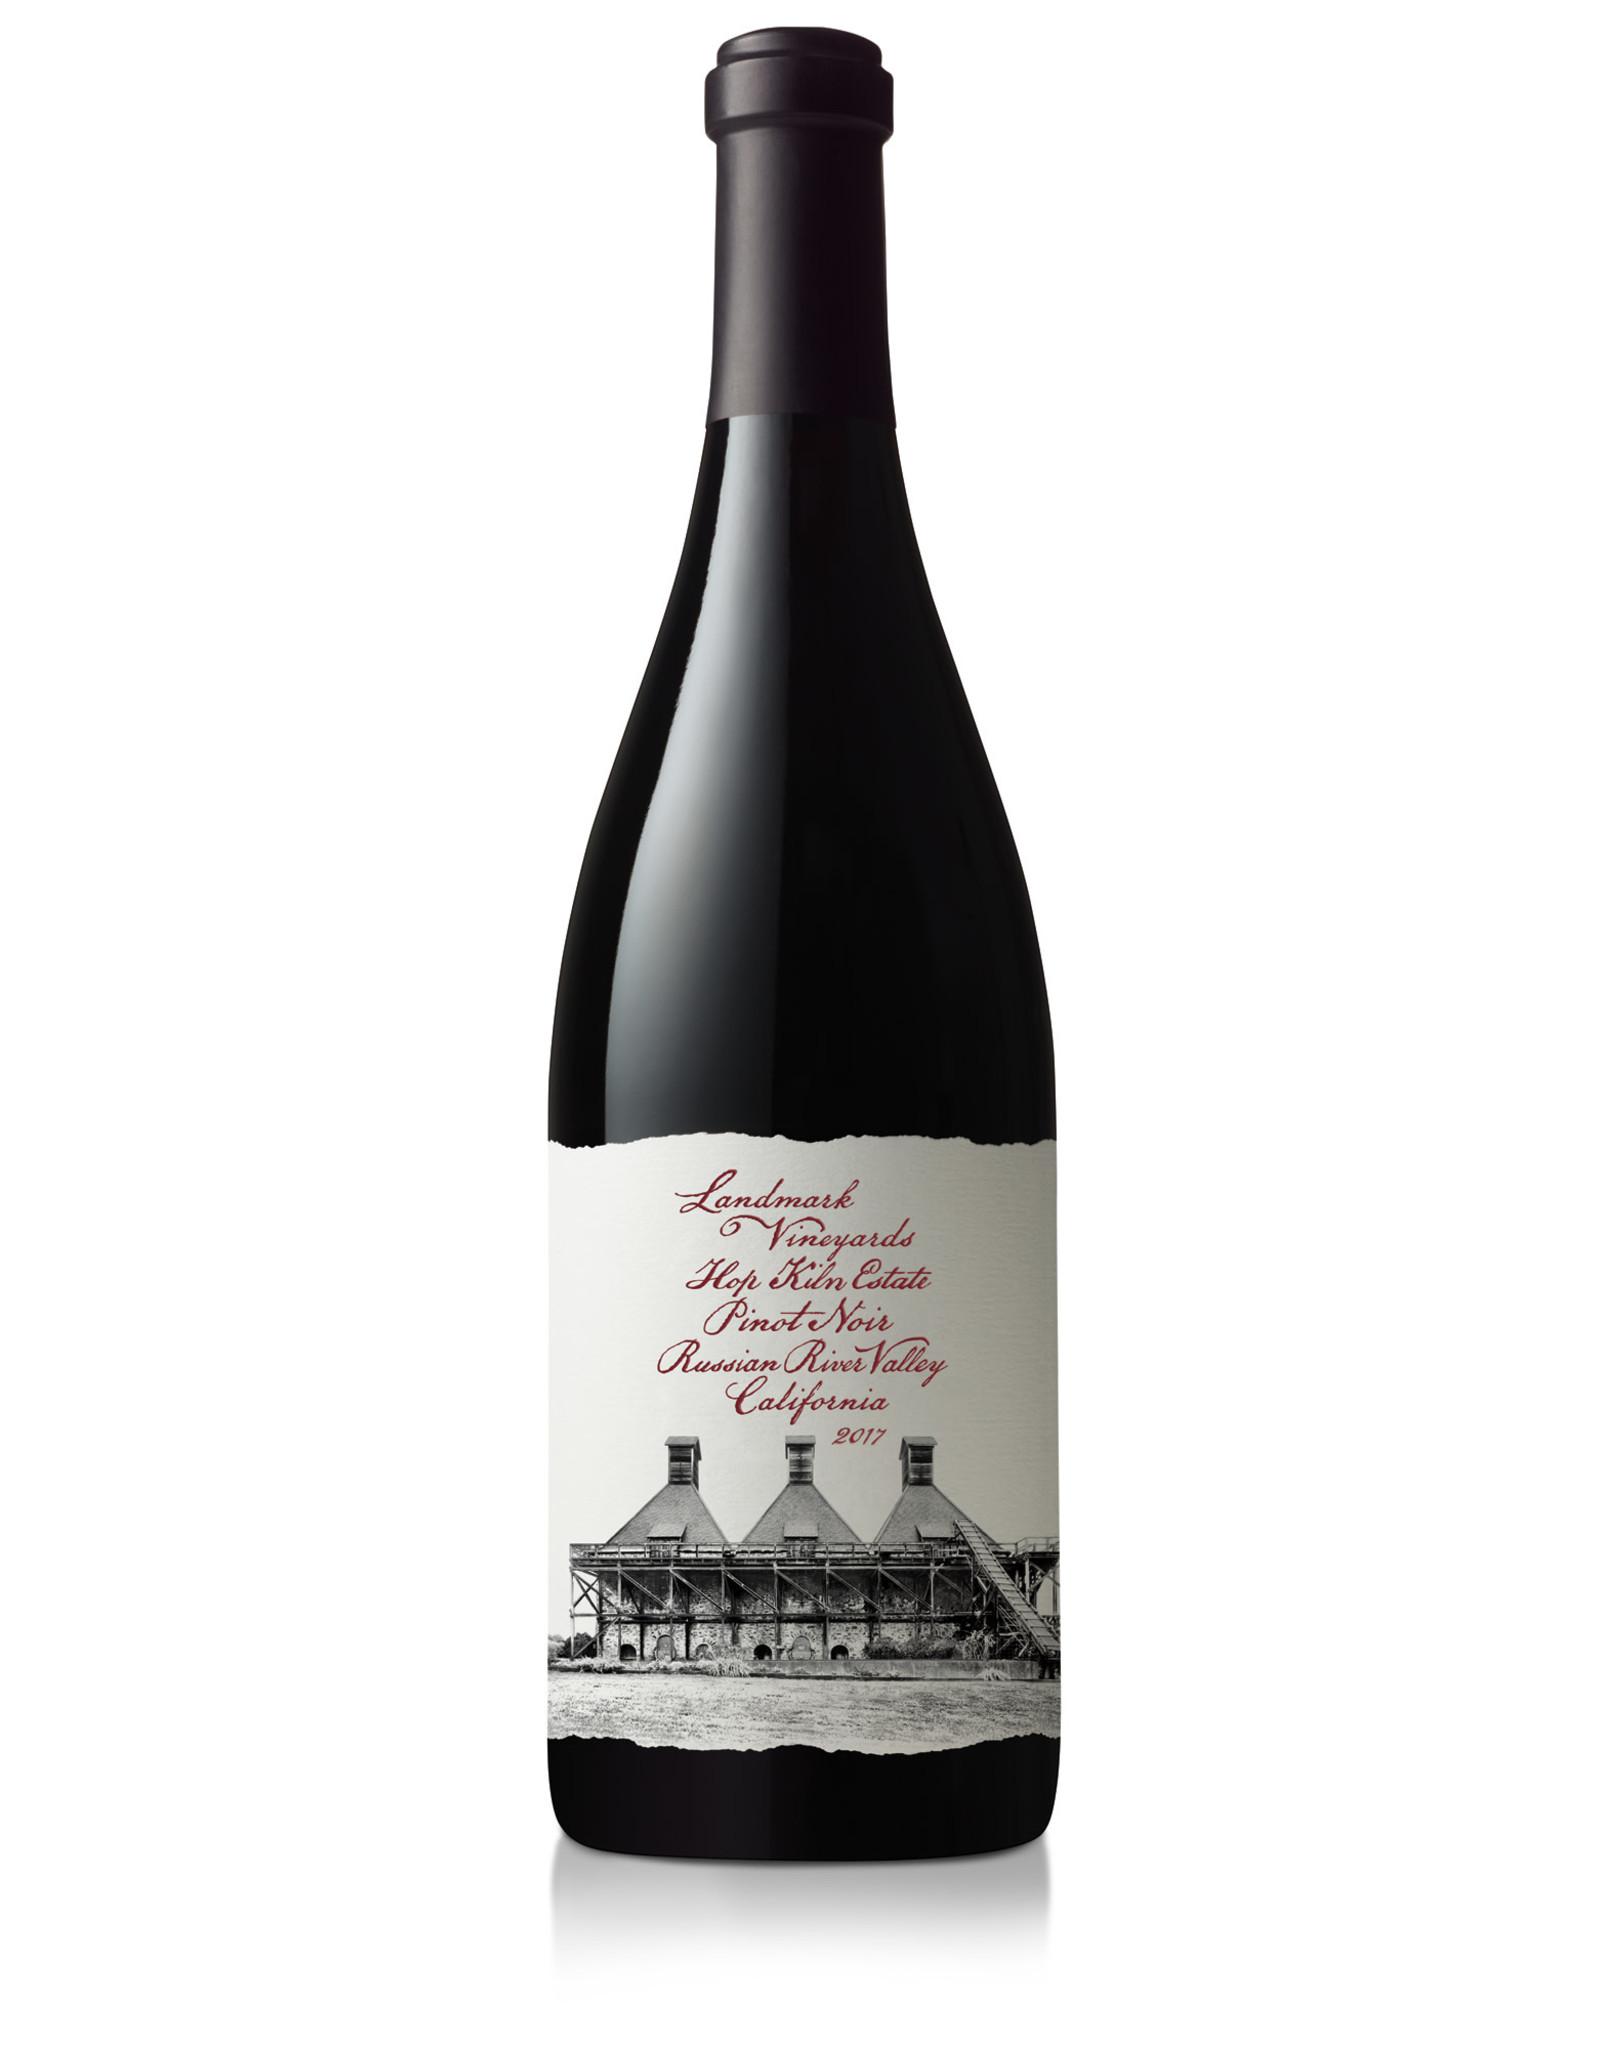 Landmark Vineyards Hop Kiln Estate Pinot Noir 2017